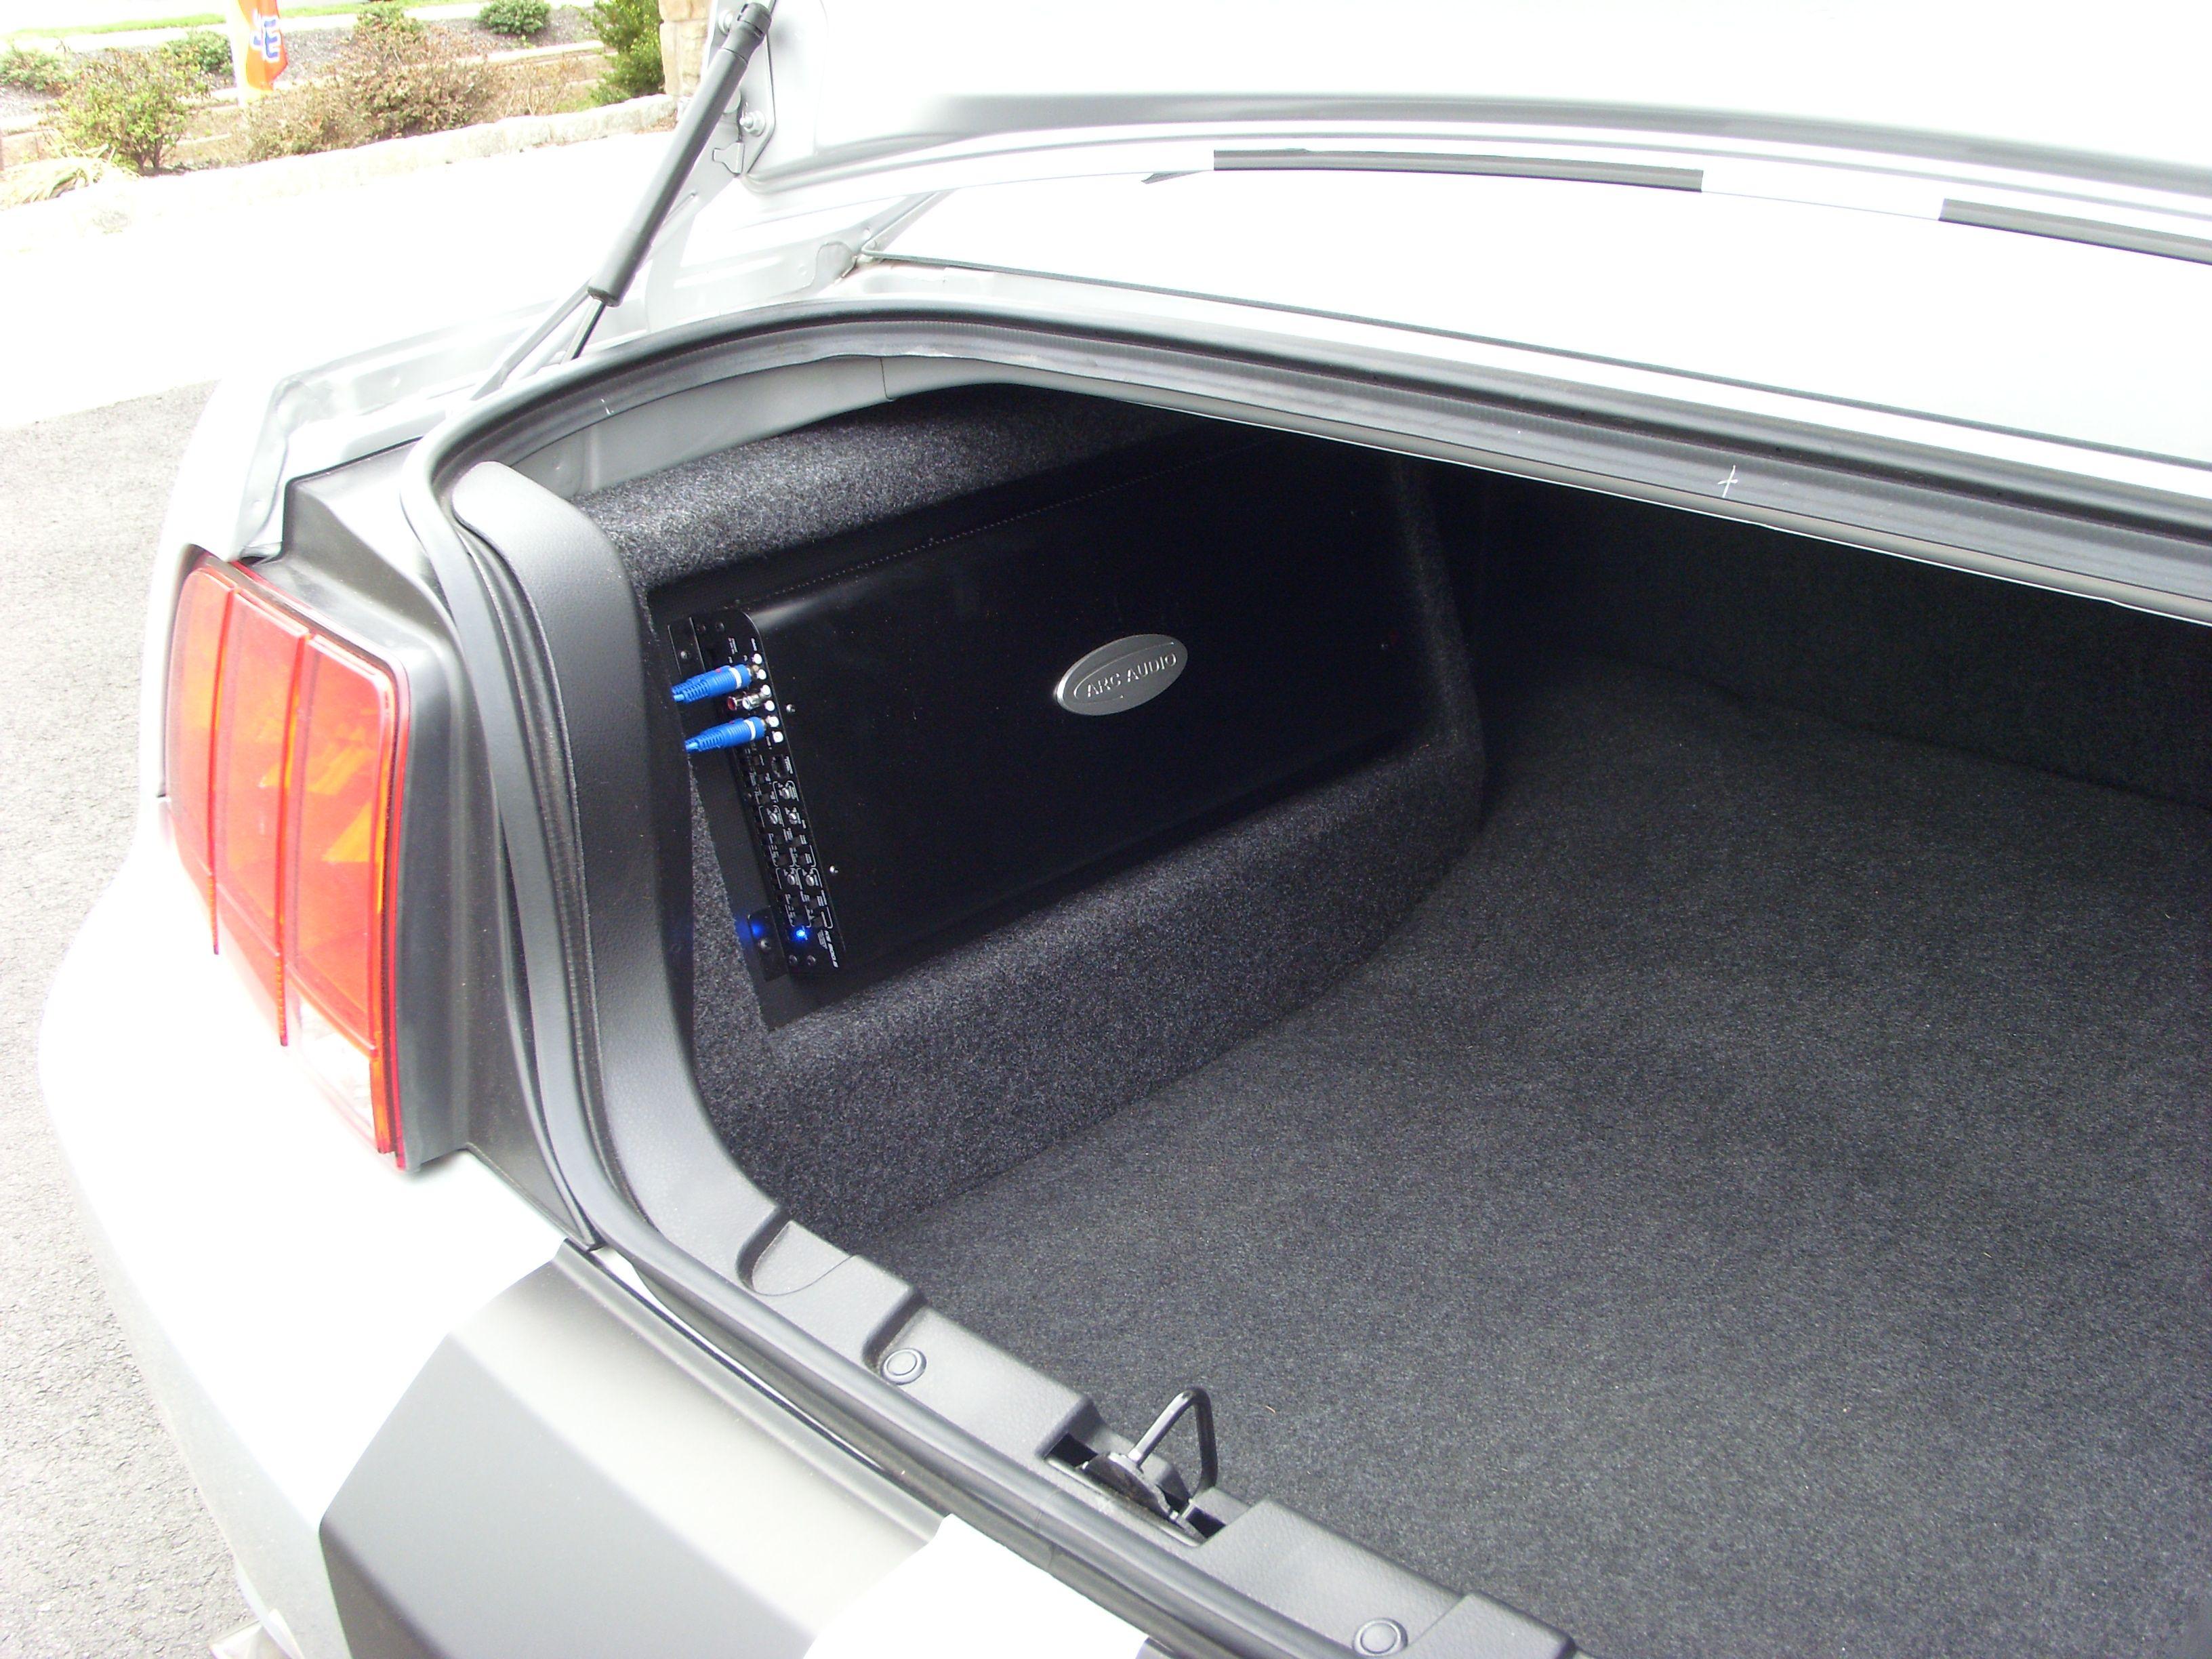 Sound Auto Mustang Amp Rack Car Audio Pinterest